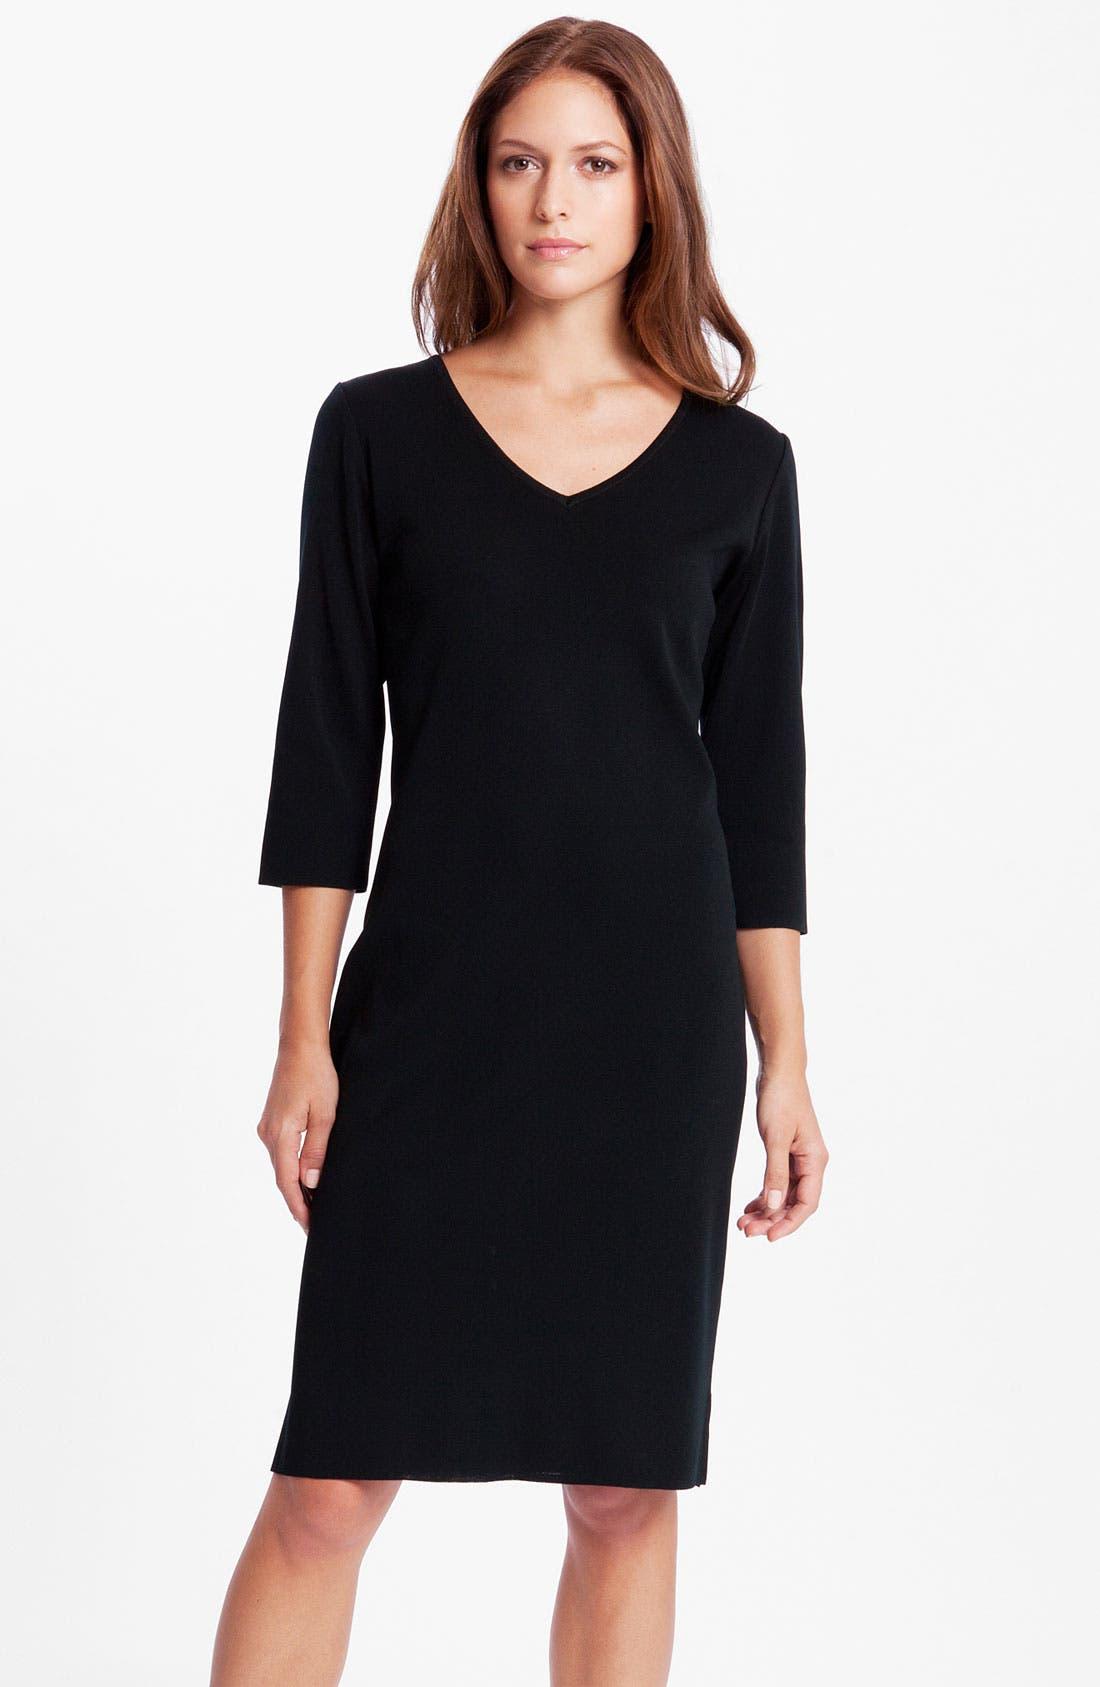 Alternate Image 1 Selected - Ming Wang V-Neck Dress